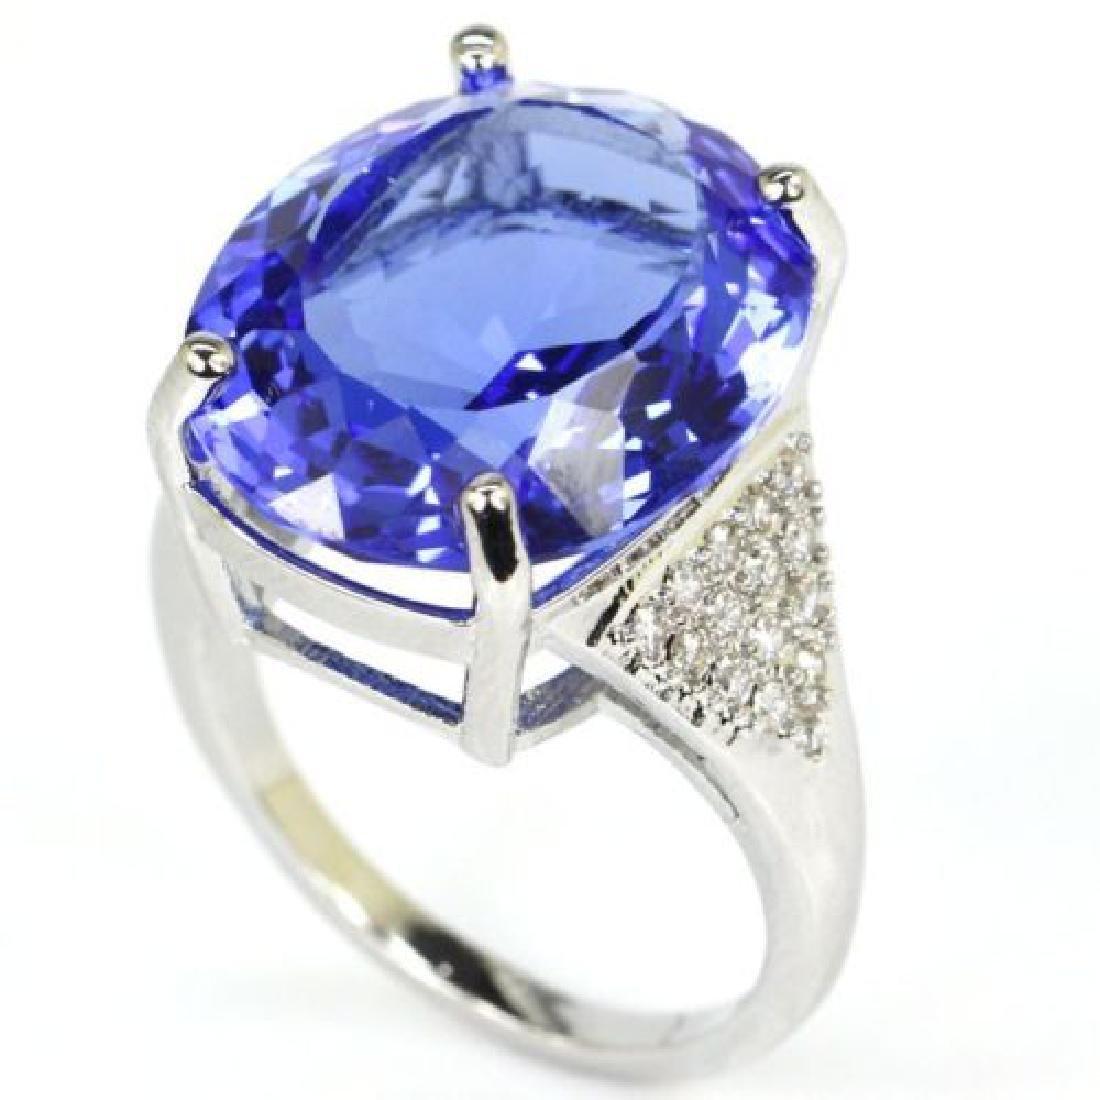 Blue Violet Tanzanite Silver Ring Us sz7.25 - 2